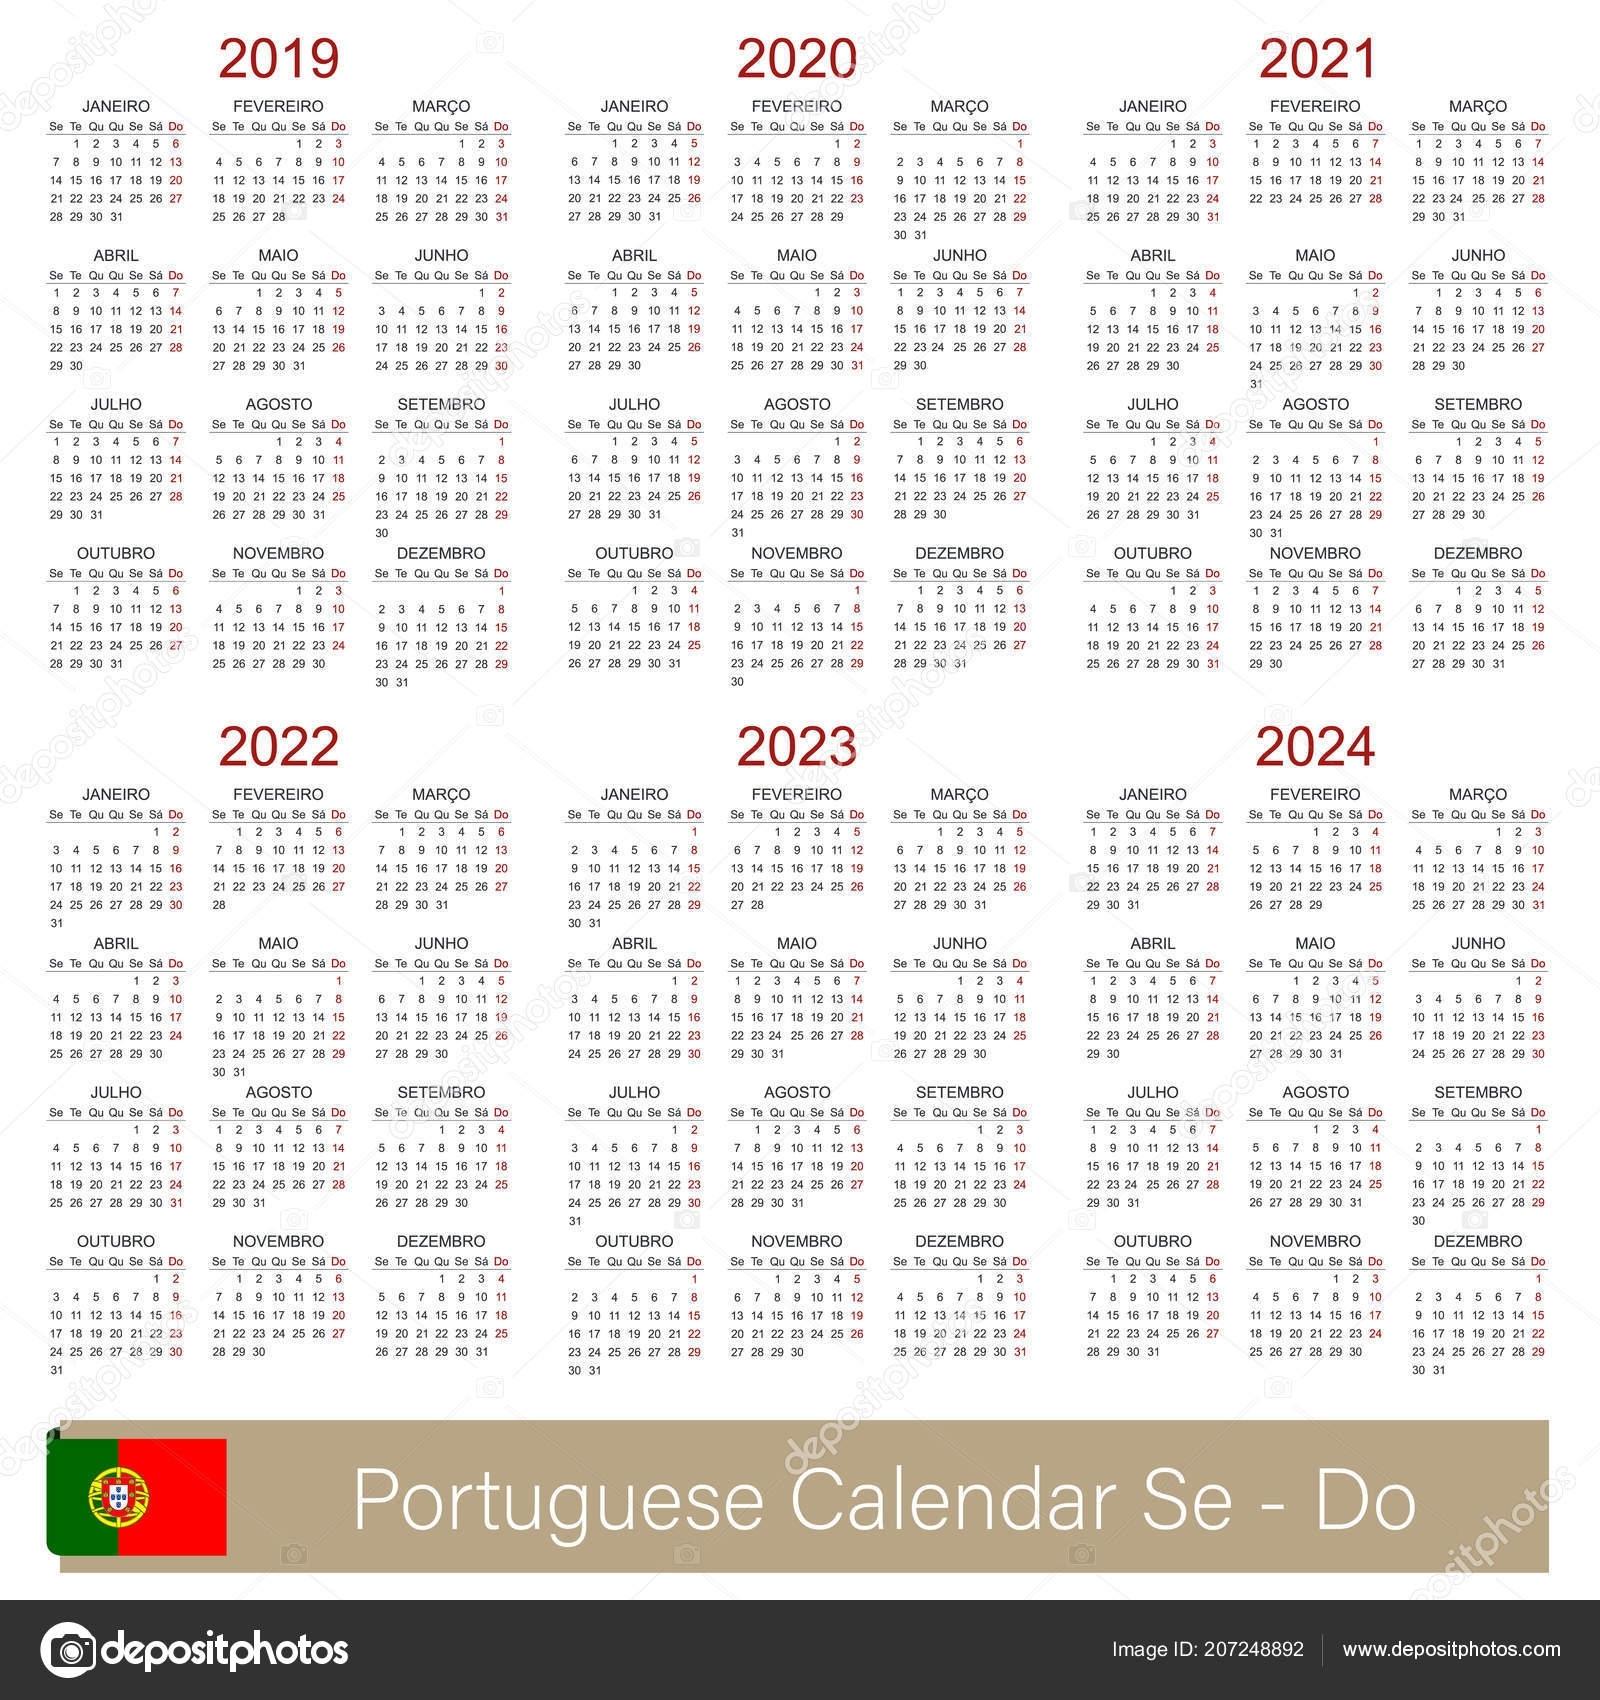 Portuguese Planning Calendar 2019 2024 Week Starts Monday Simple regarding Print 2019, 2020, 2021, 2022, 2023, Calender